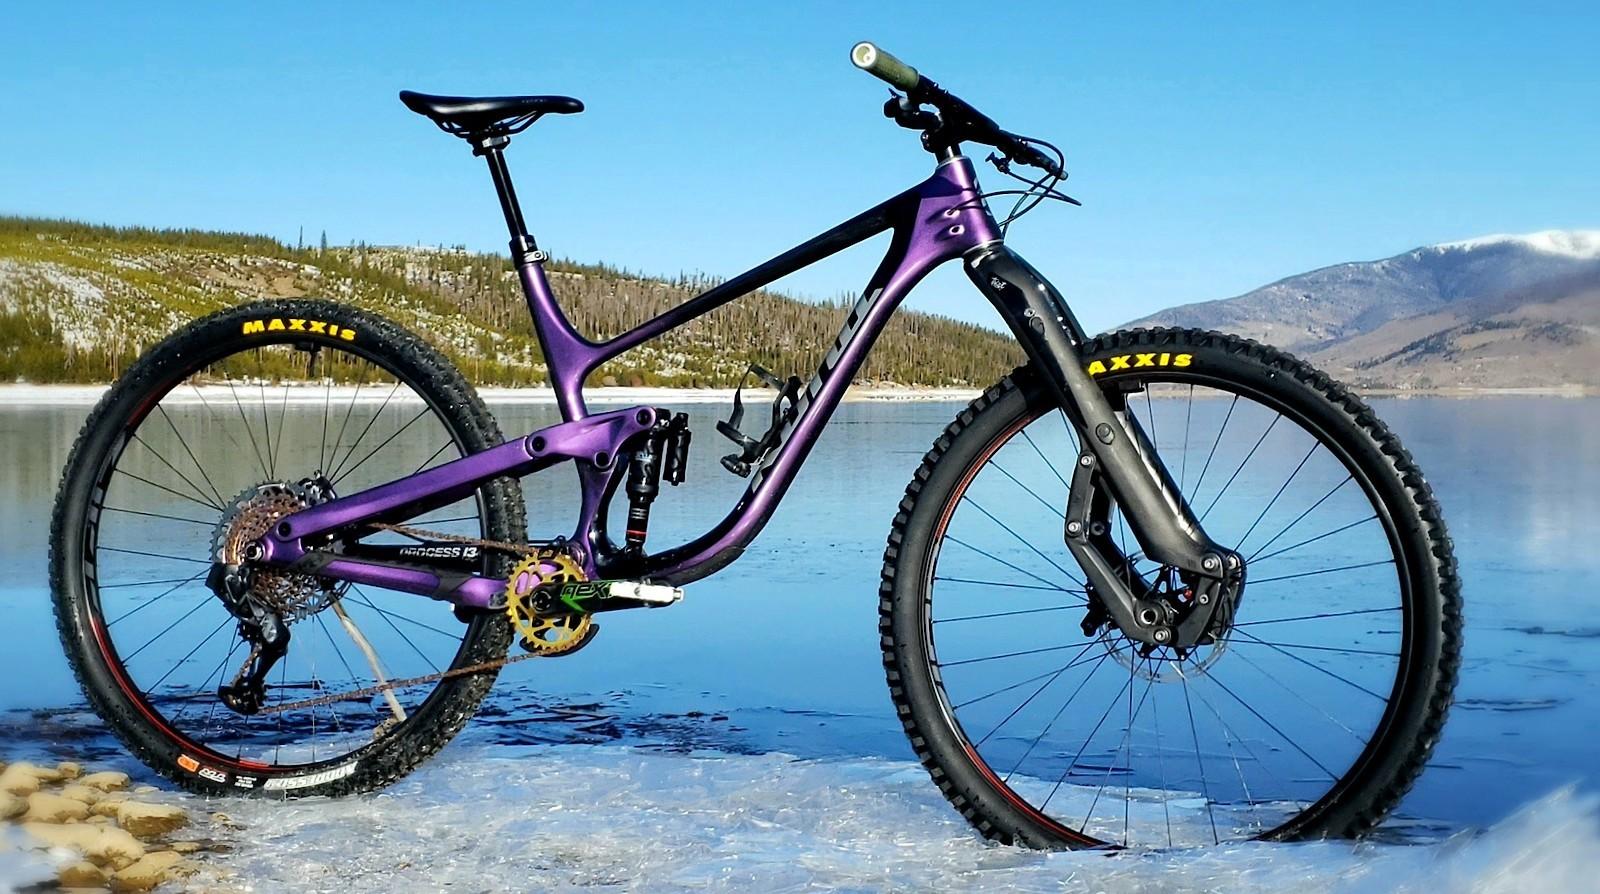 Kona Process 134 - Vital Bike of the Day December 2020 - Mountain Biking Pictures - Vital MTB